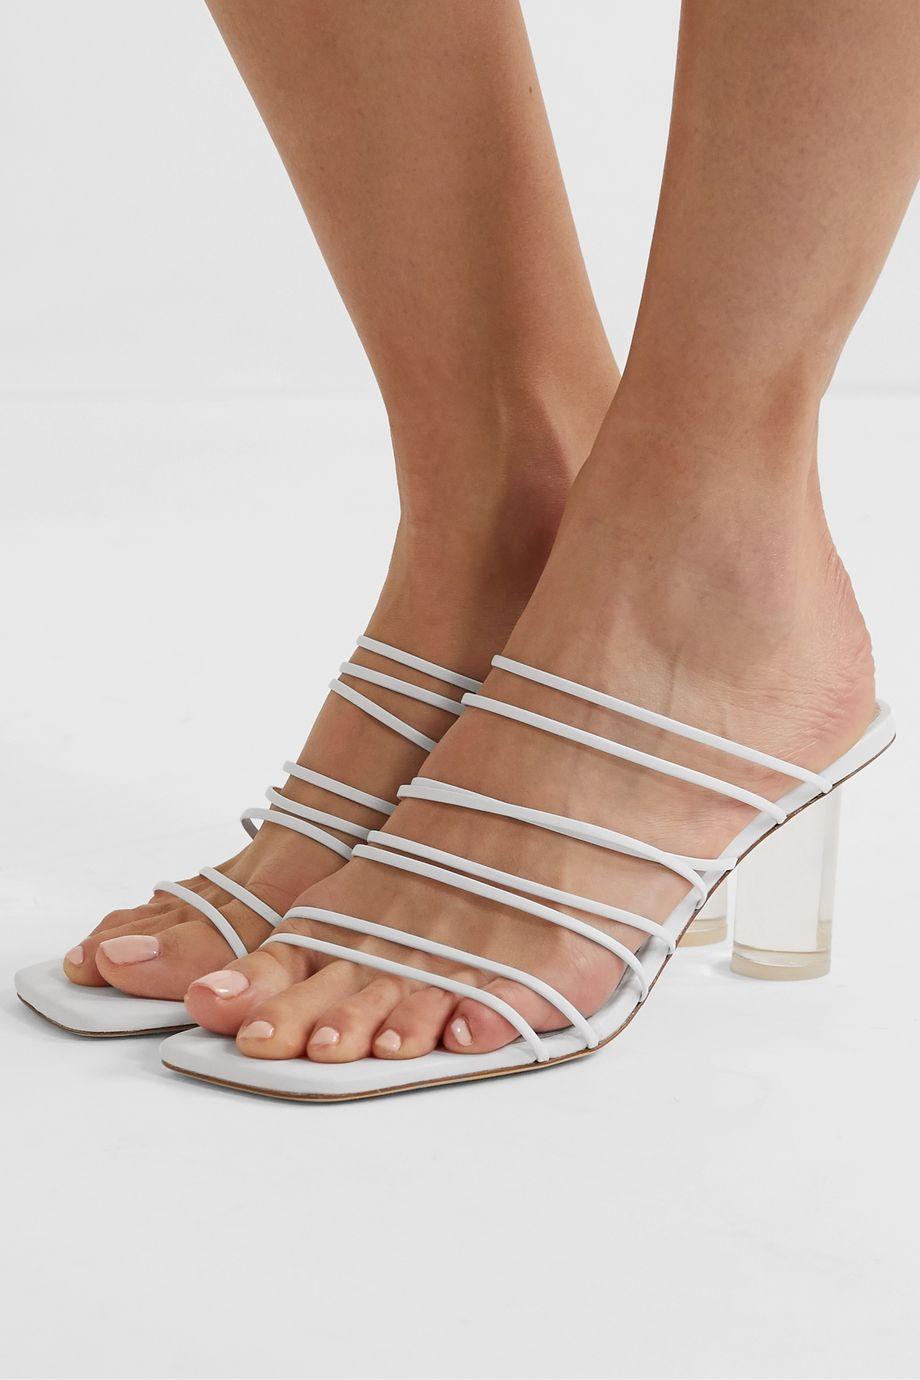 REJINA PYO Zoe leather sandals